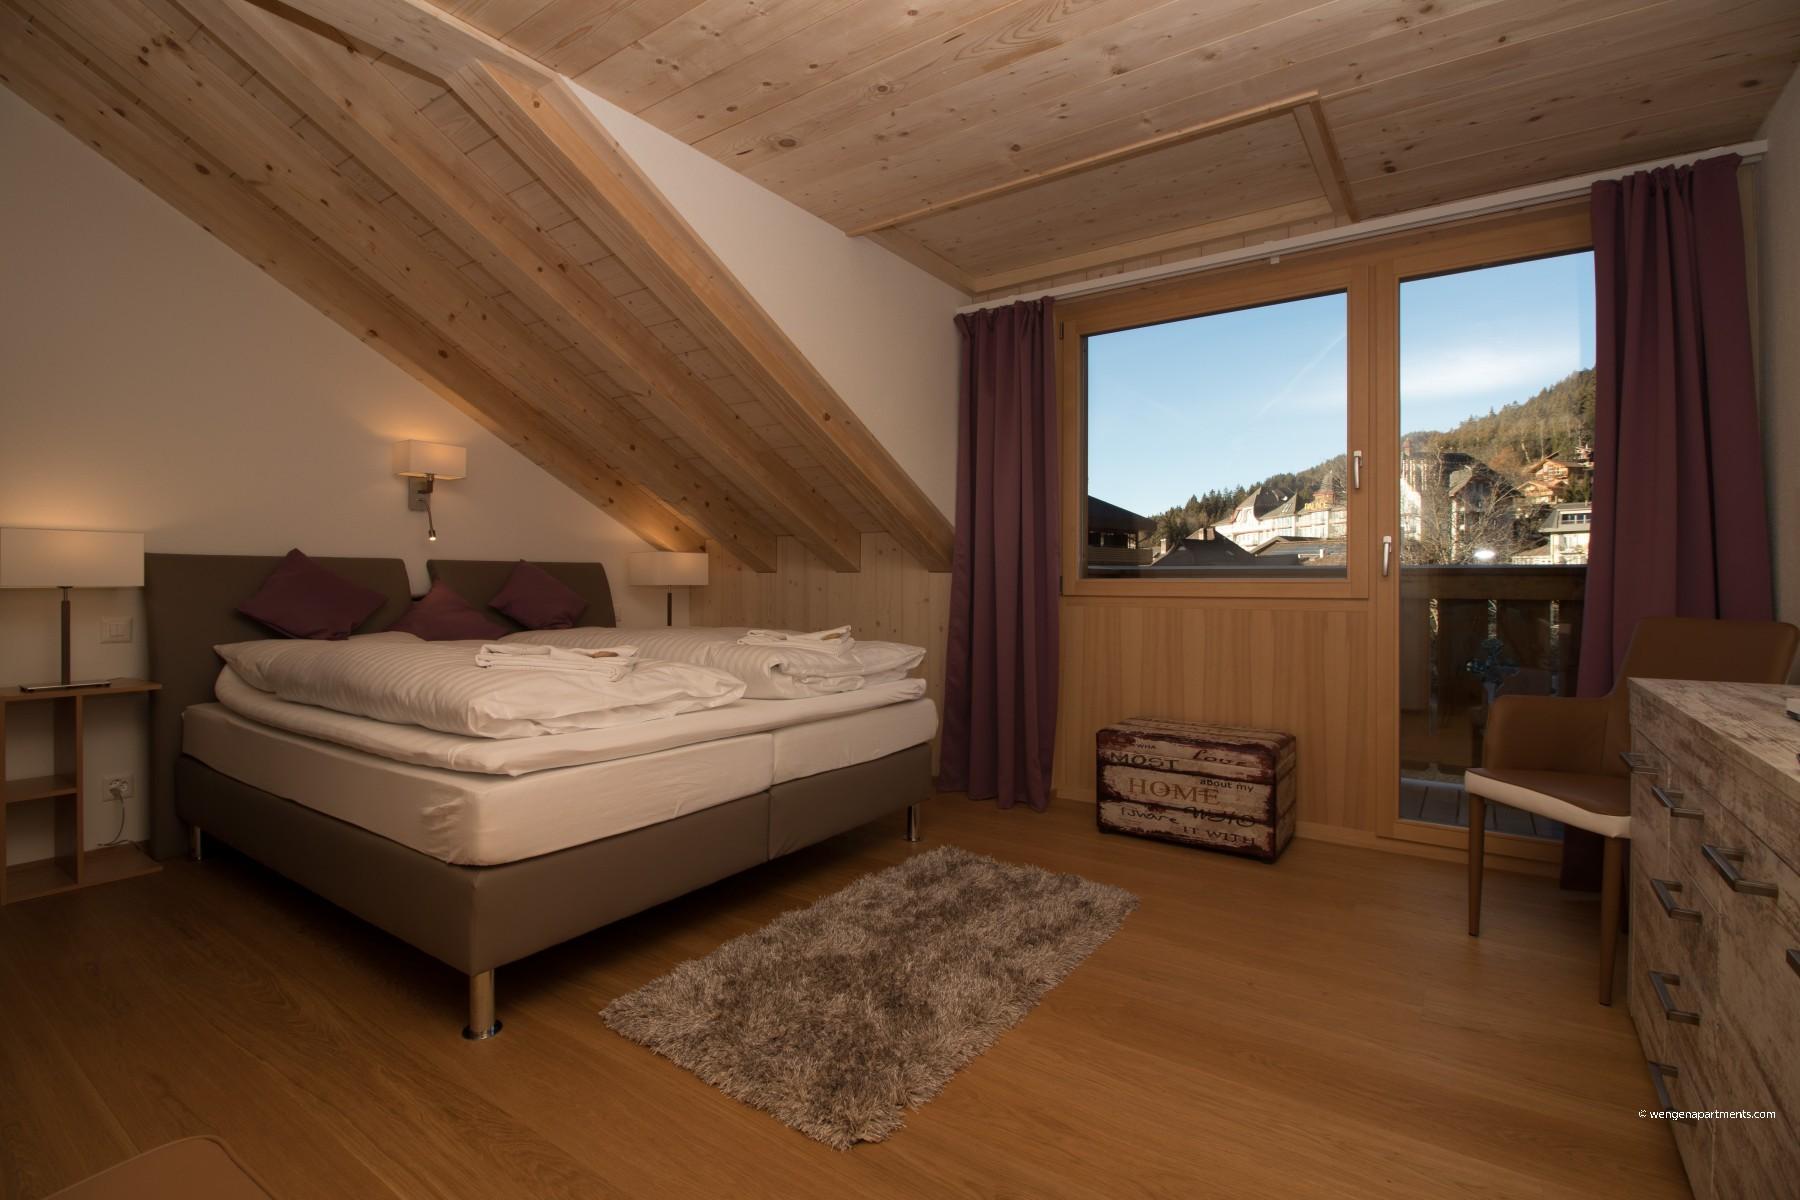 10 modern schlafzimmer bank designs, apartments in wengen - chalet belmont penthouse, Design ideen